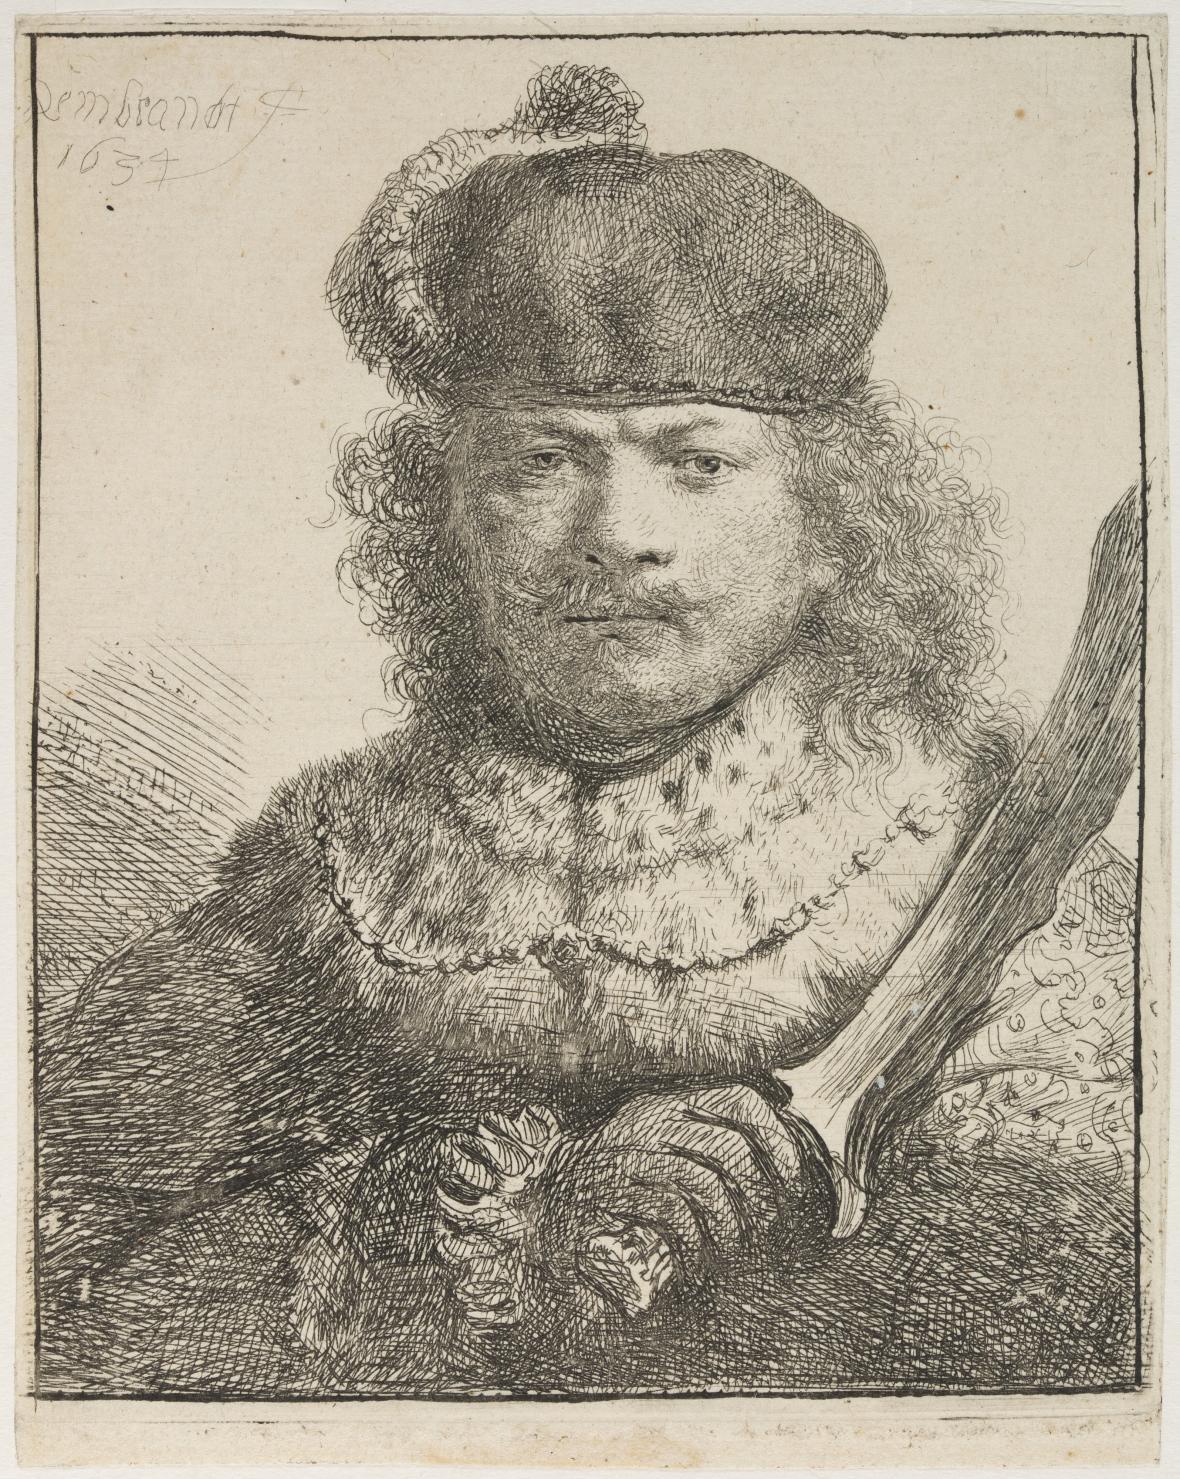 Rembrandt van Rijn / Autoportrét se vztyčenou šavlí, 1634